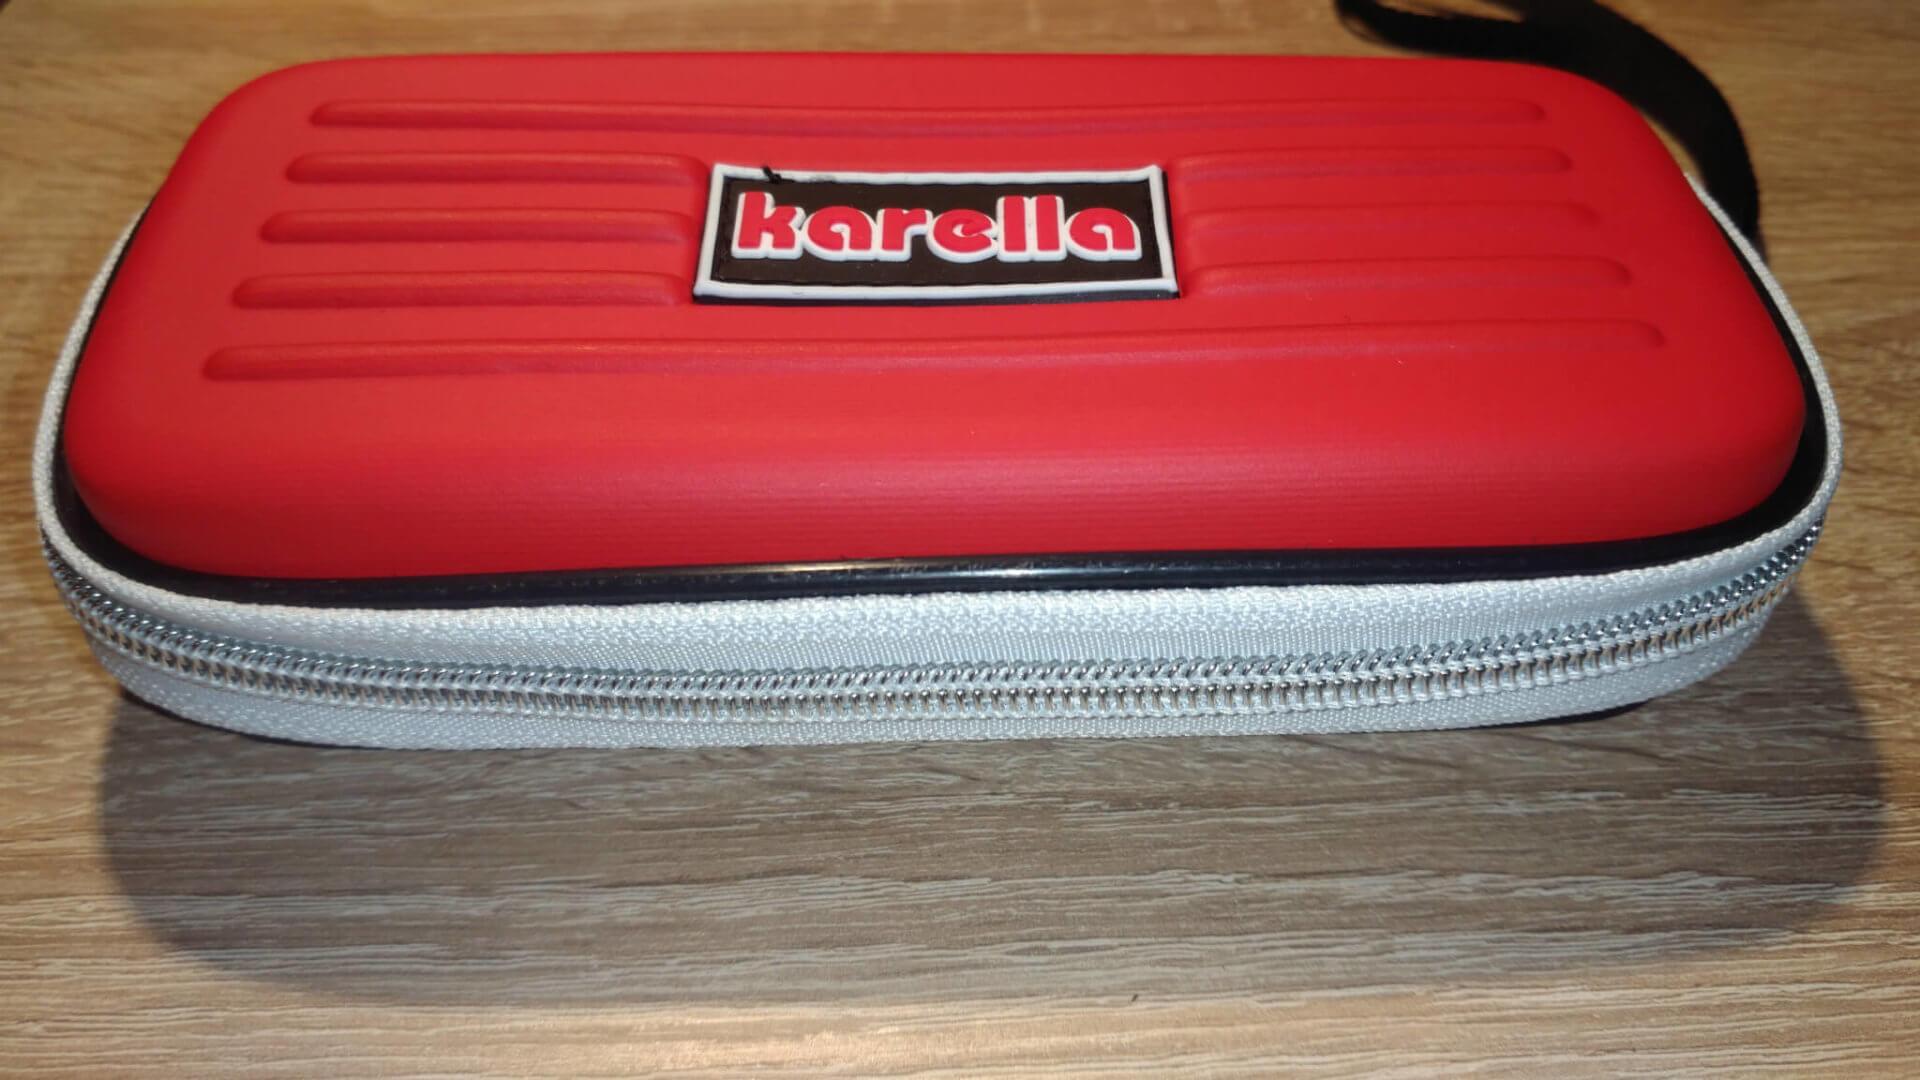 Karella - Dartcase